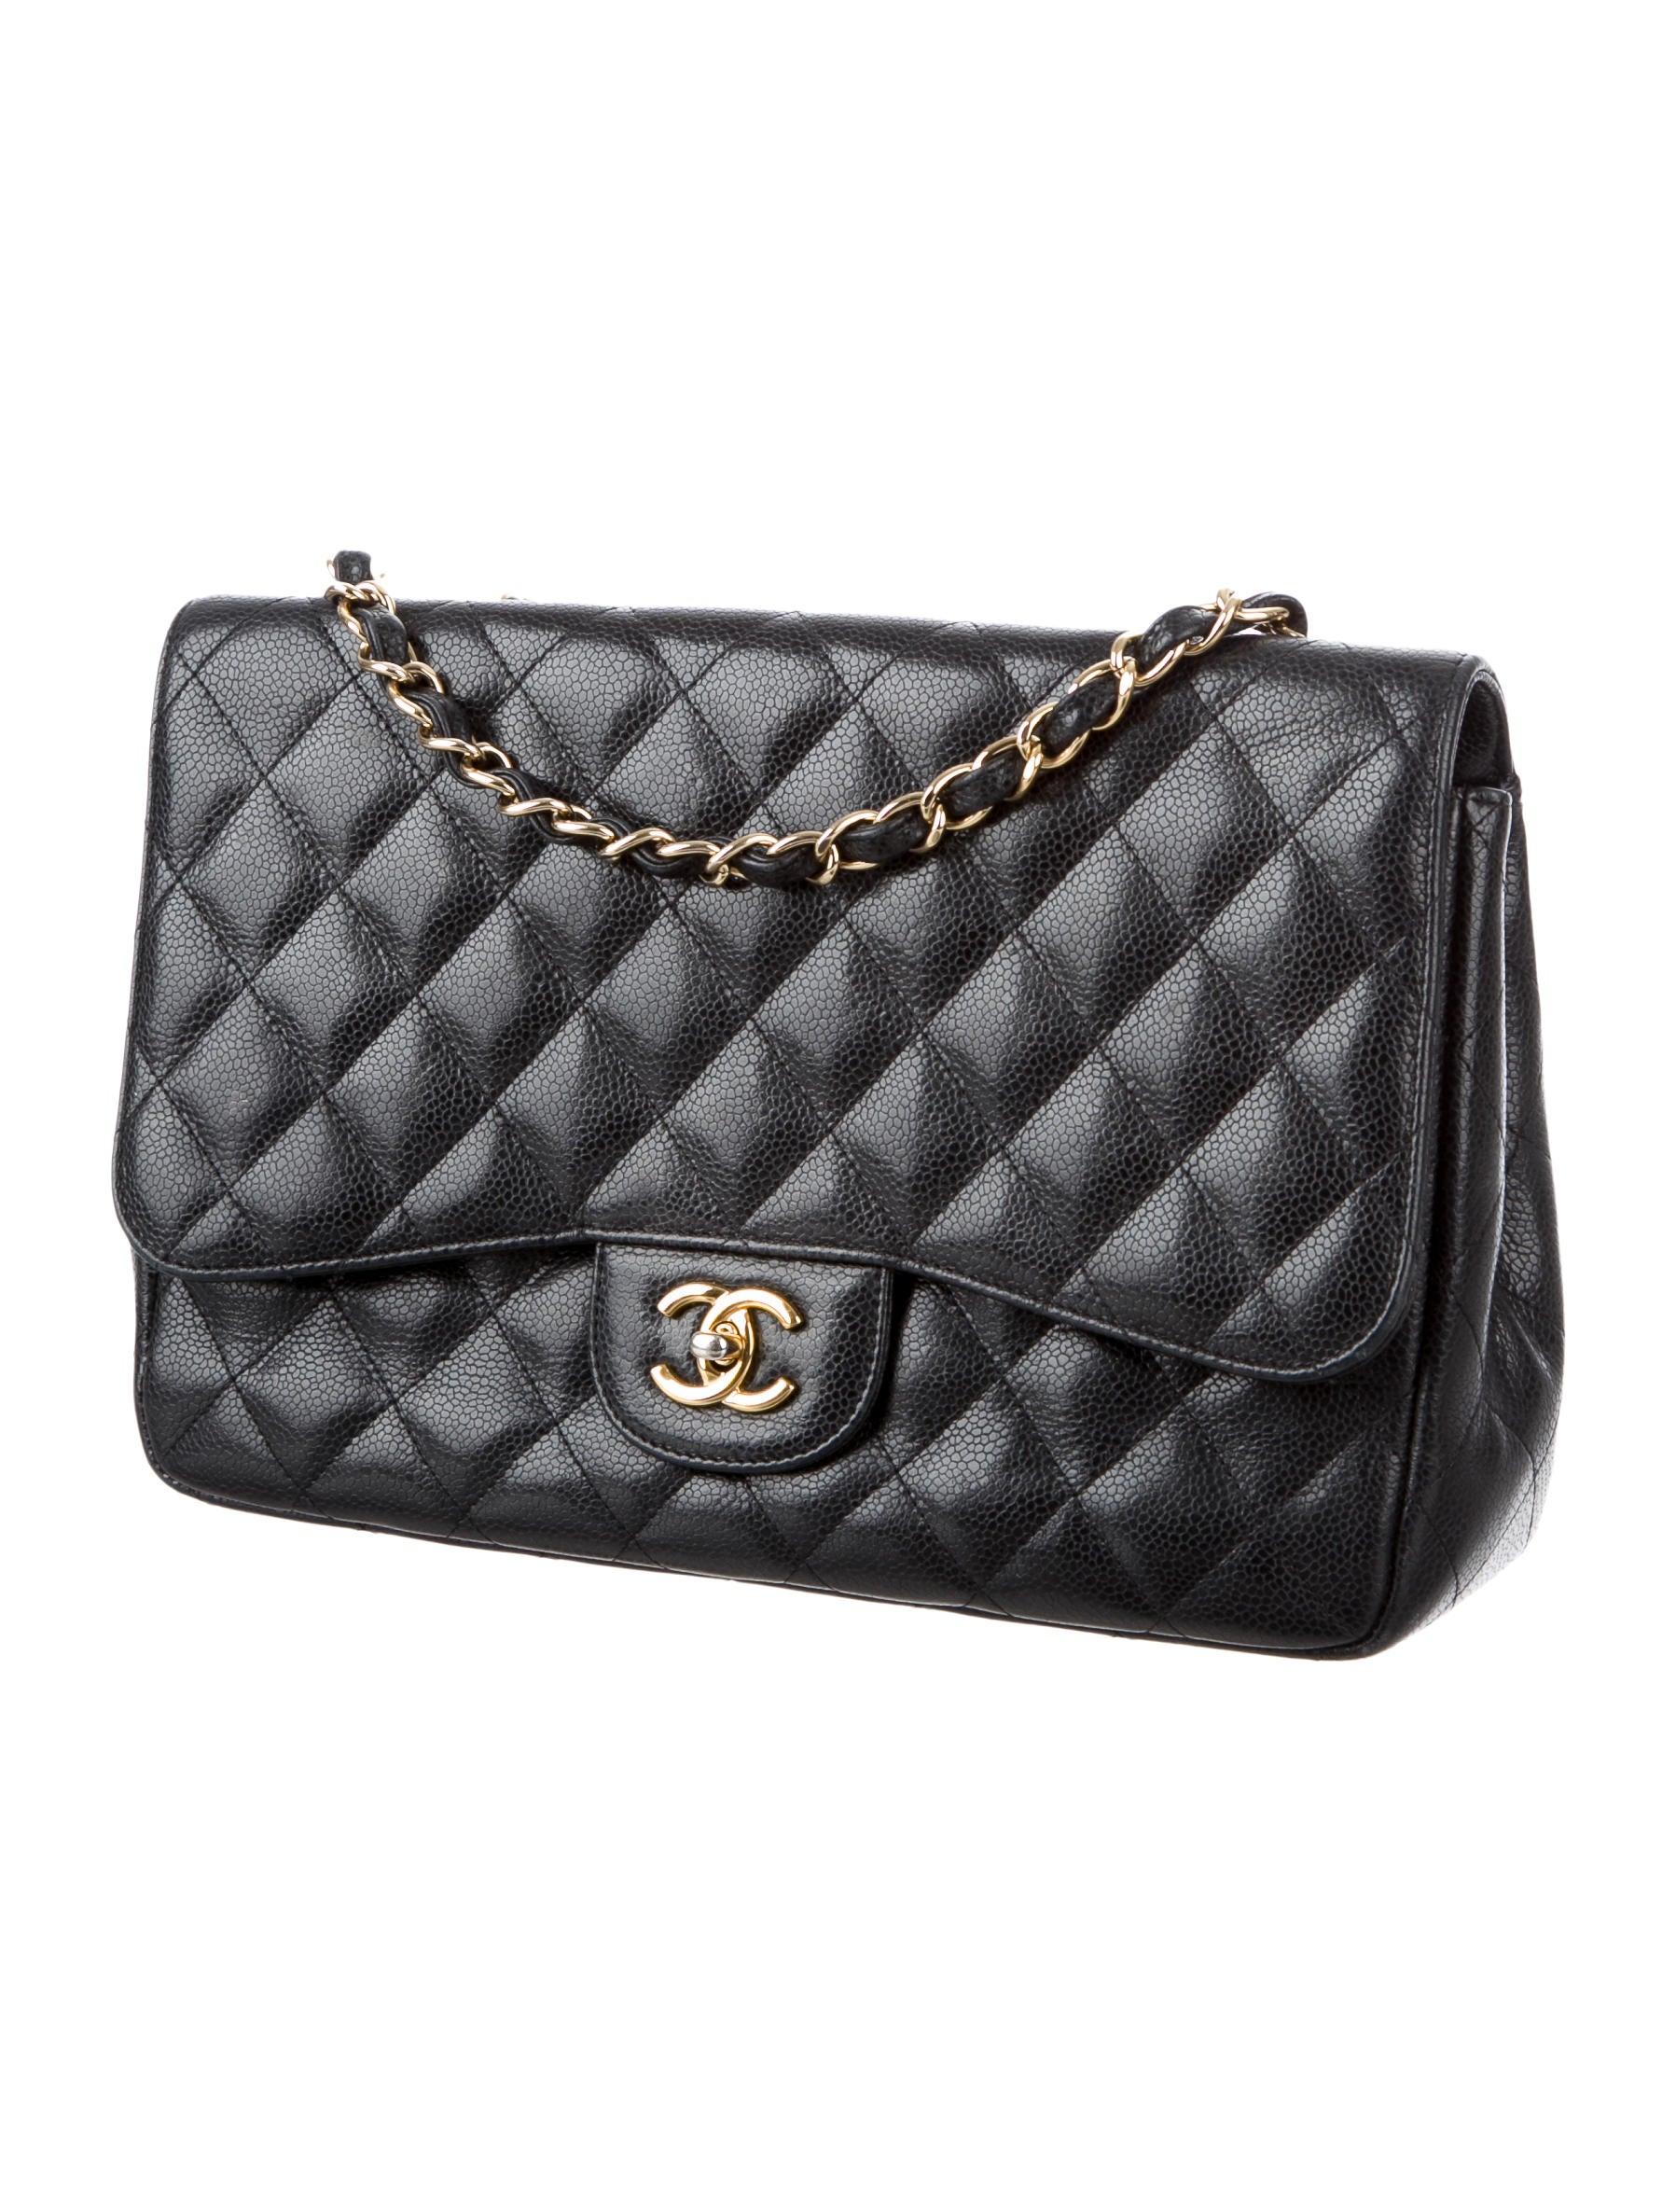 fe126c2dd599 Chanel Caviar Classic Jumbo Single Flap Bag - Handbags - CHA176007   The  RealReal